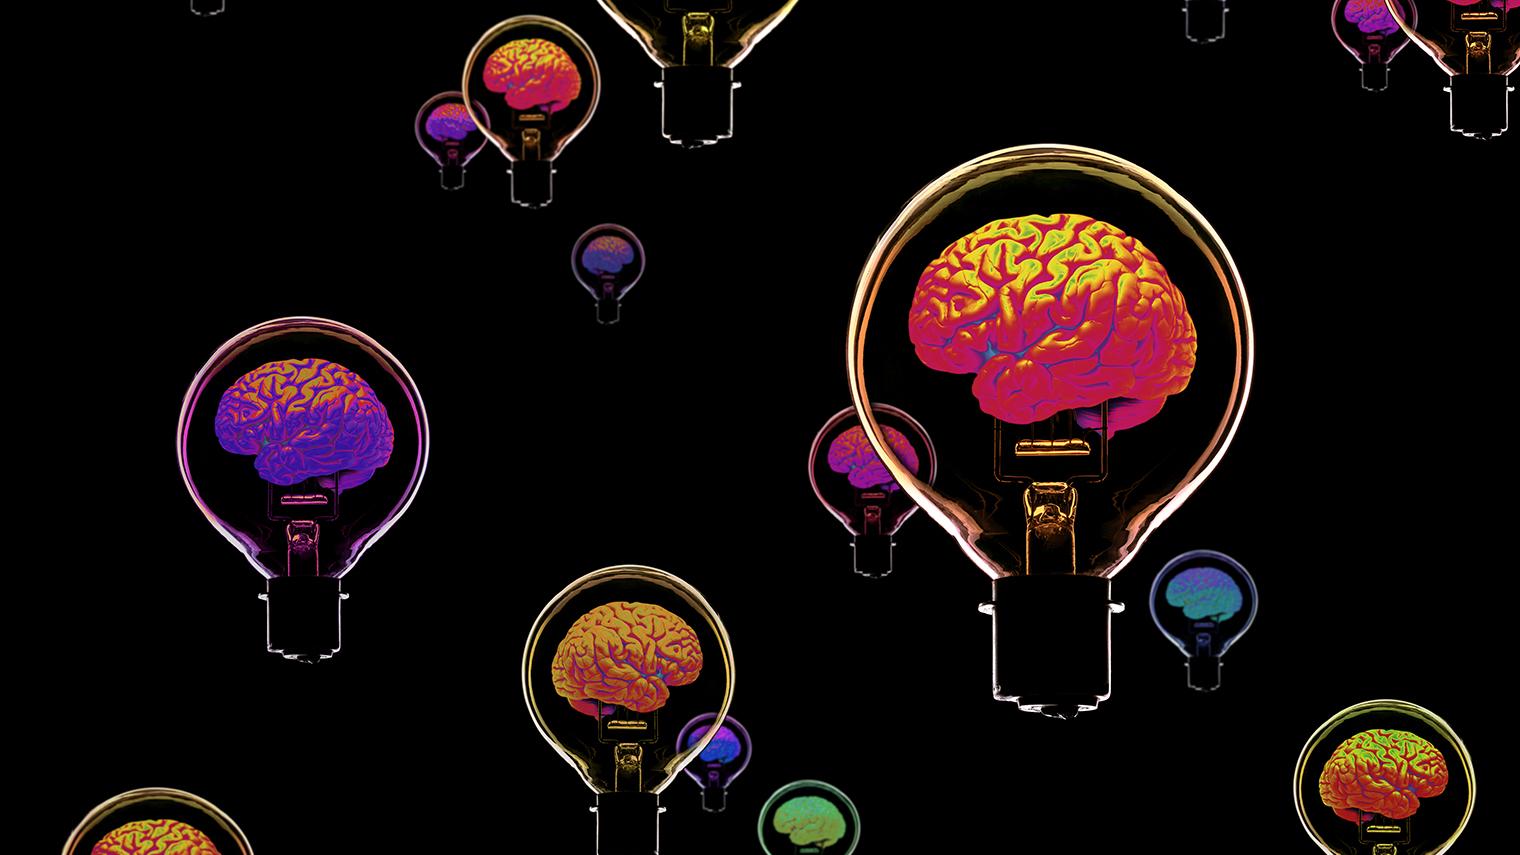 Brains within light bulb illustration